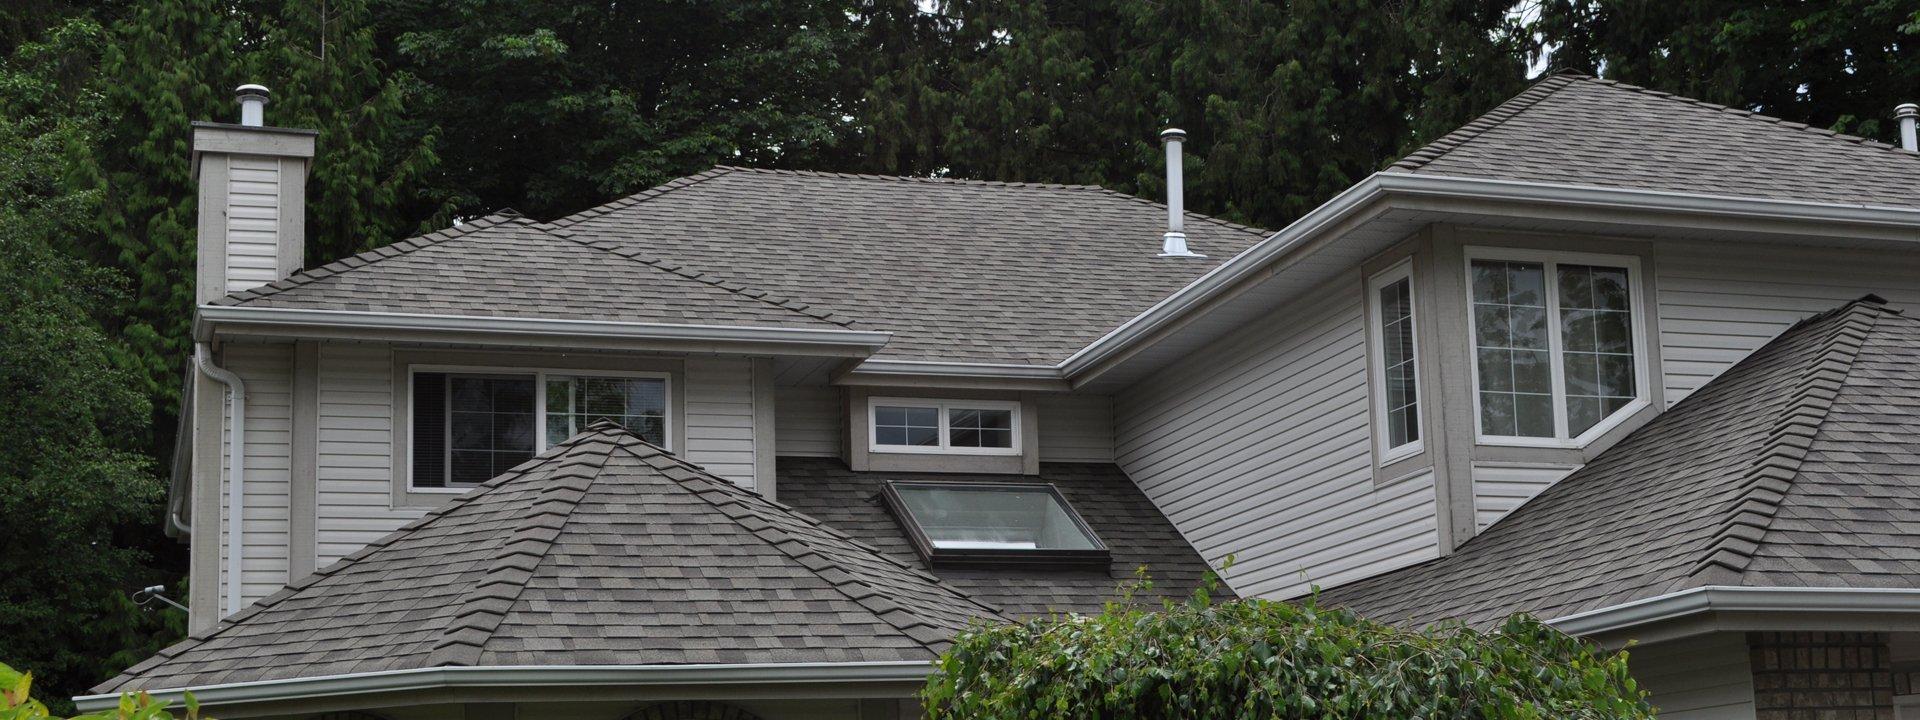 Home Renovations & Upgrades